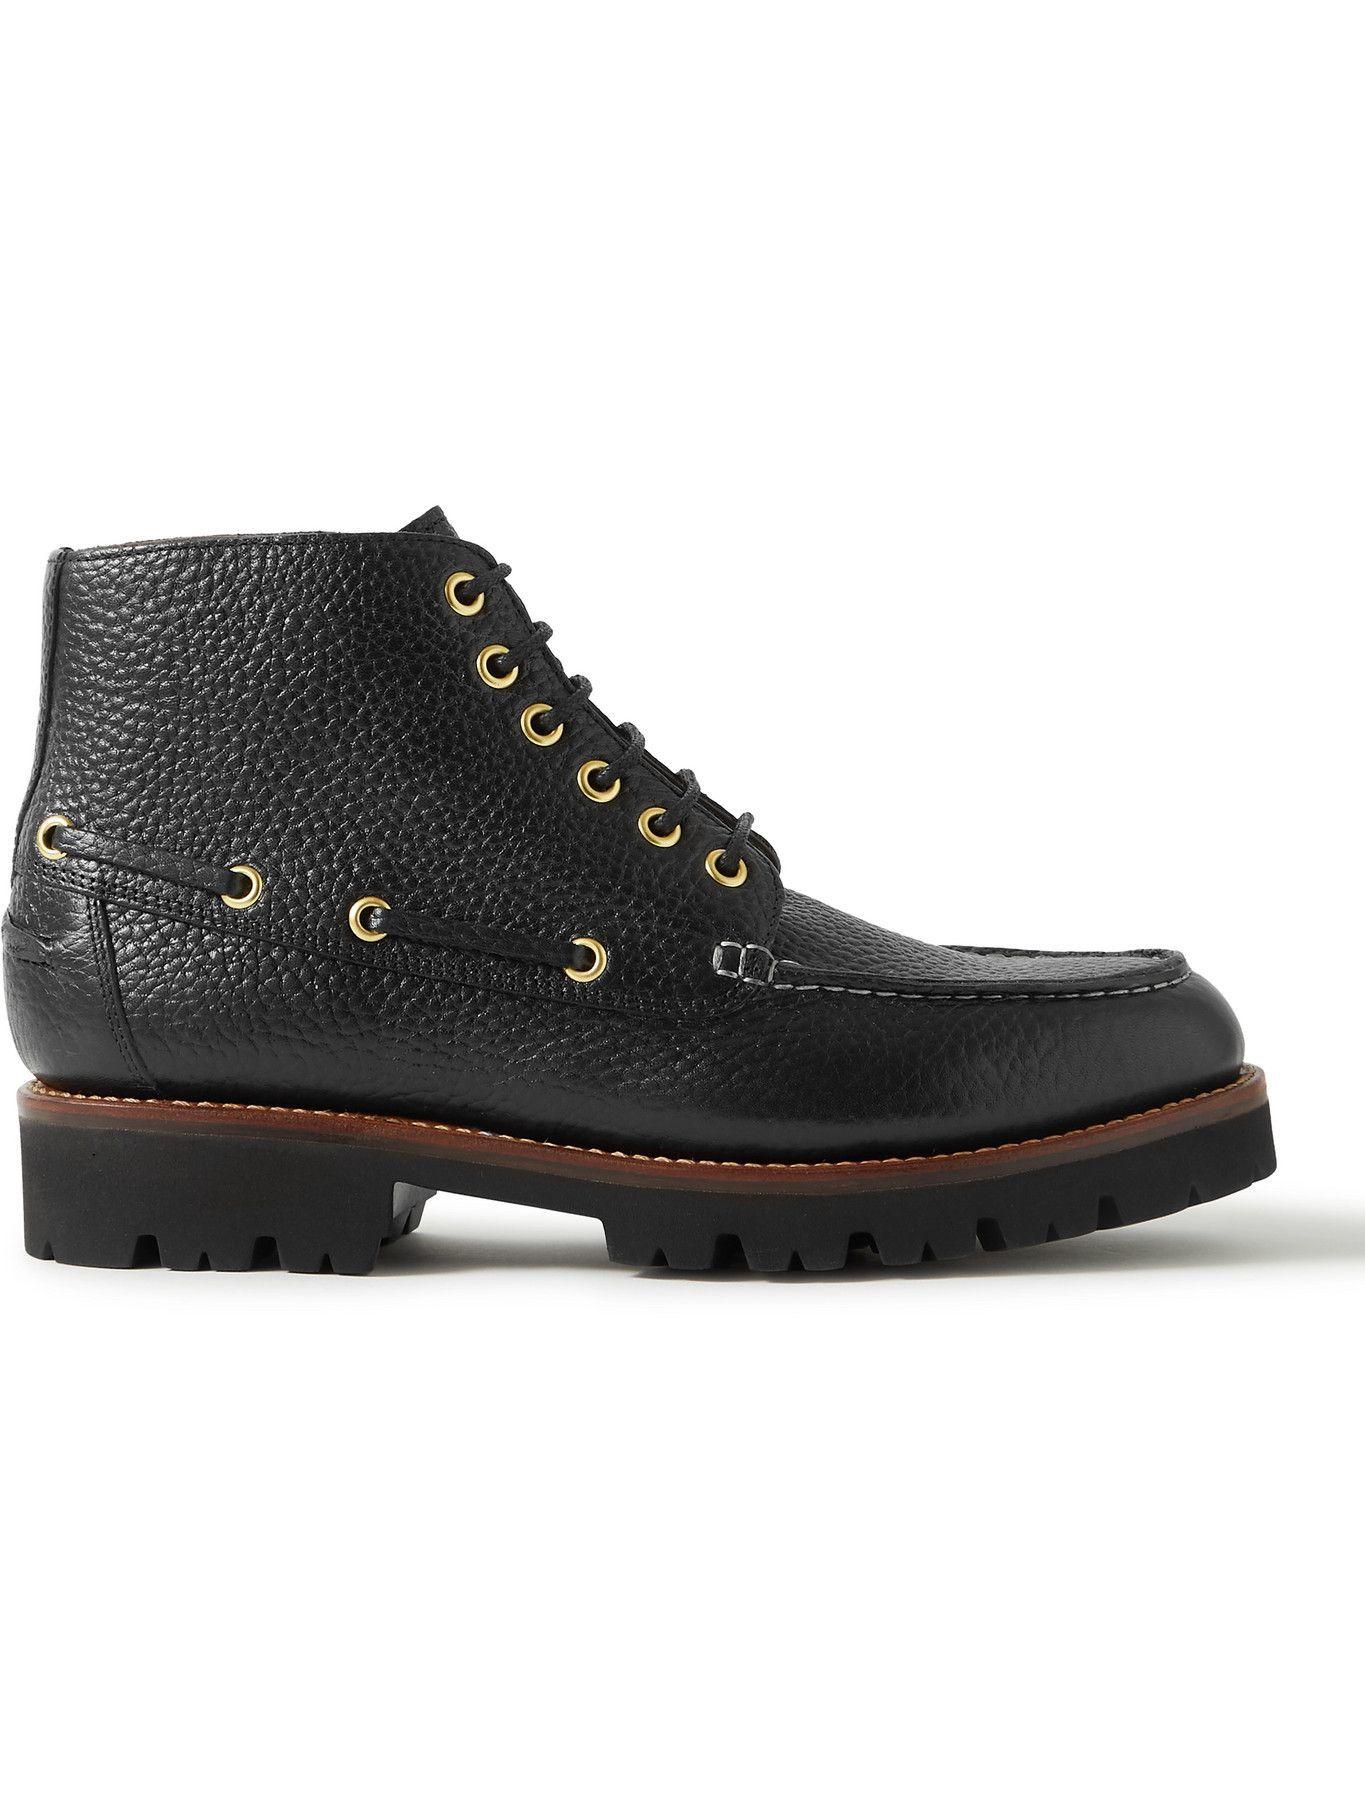 Photo: Grenson - Easton Full-Grain Leather Boots - Black